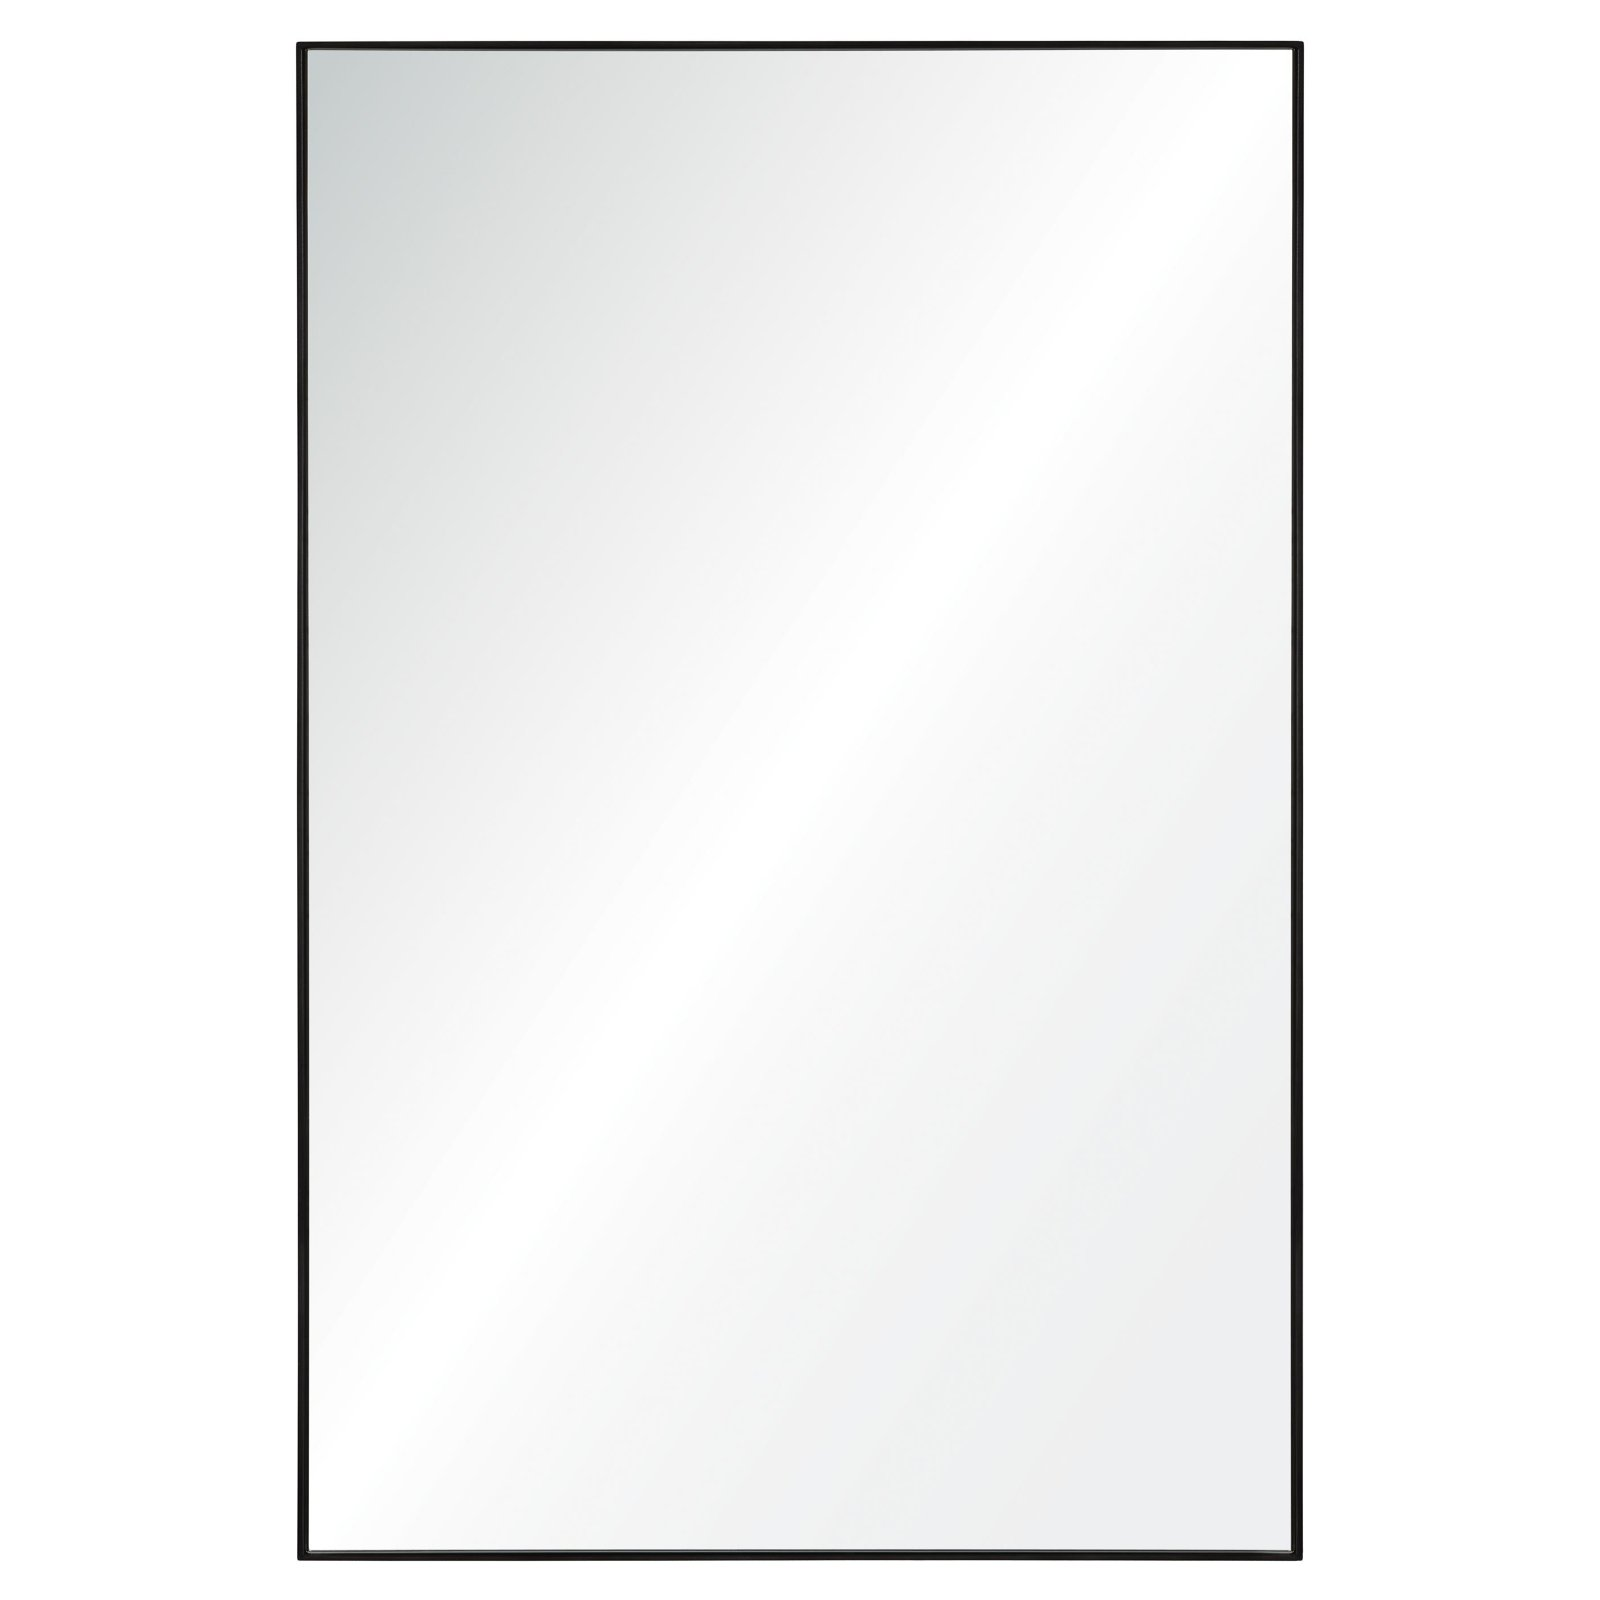 Ren-Wil Vale Wall Mirror - 21W x 32H in.